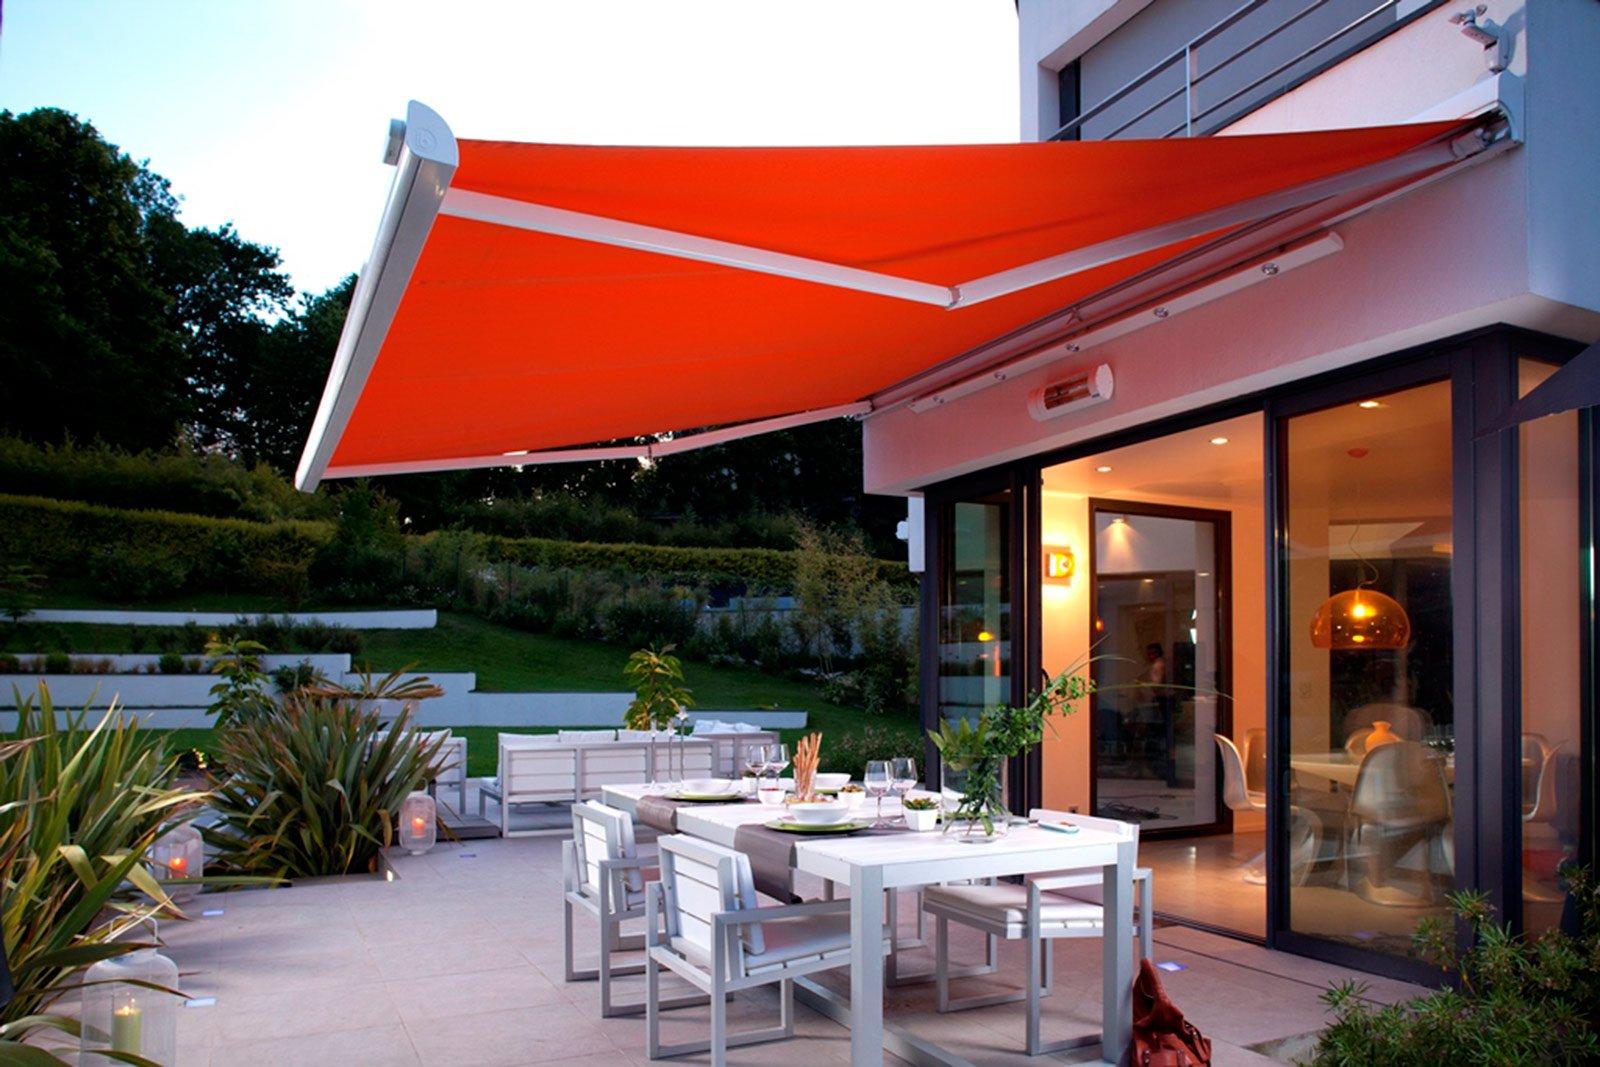 Tende da Sole Ventimiglia Imperia Costa Azzurra | vendita ed installazione Tende da Sole Vele da Sole Tende a Pergola Ventimiglia Imperia Costa Azzurra | LAURO SERRAMENTI